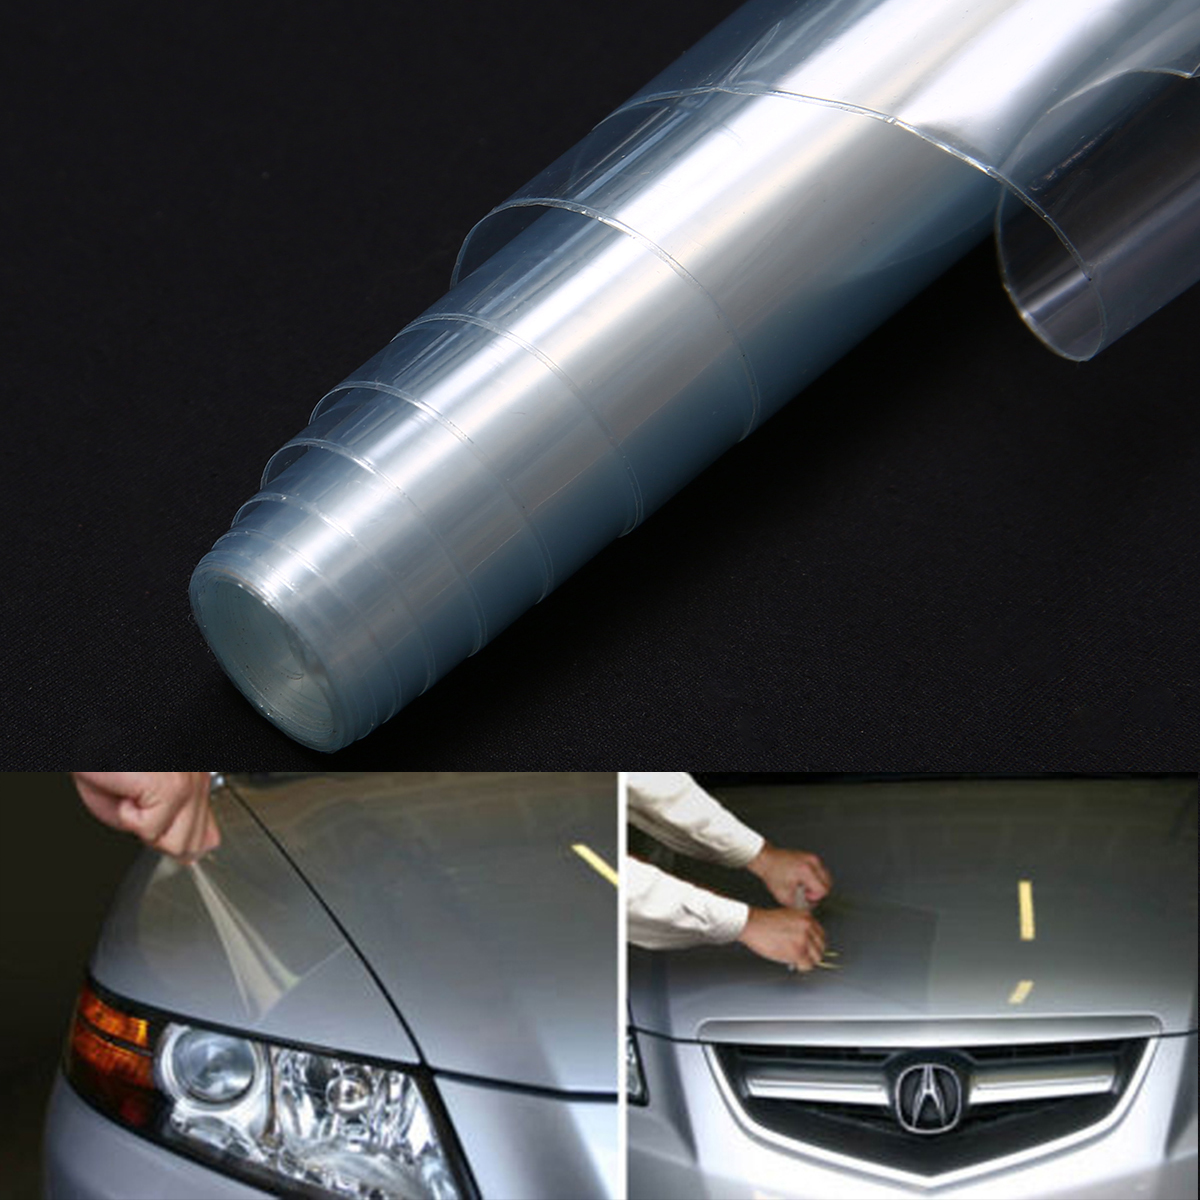 30 x 120cm Transparent Car Styling Headlight Sticker Brake Tail Light Tint Vinyl Wrap Film Sheet Cover Sticker Protection